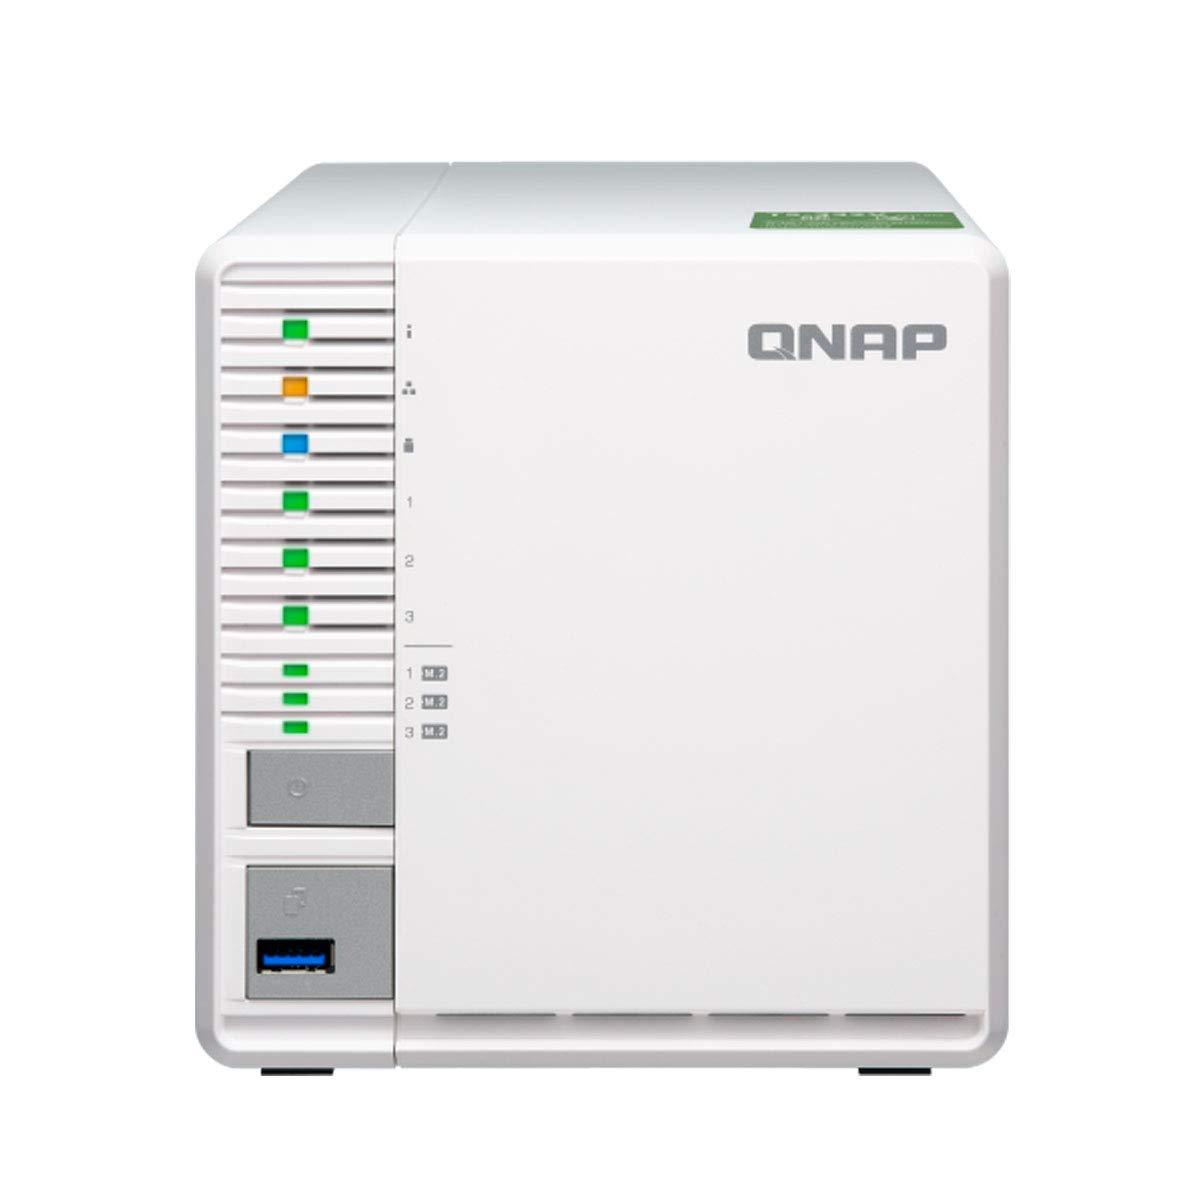 QNAP TS-332X (4GB RAM Version) 3-Bay 64-bit NAS with Built-in 10G Network. Quad Core 1.7GHz, 4GB RAM, 1 X 10Gbe(Sfp+), 2 X 1GbE, 3 X 3.5''/2.5'' Drive Slots, 3 X M.2 SATA 2280 Slots, RAID 0/1/5 by QNAP